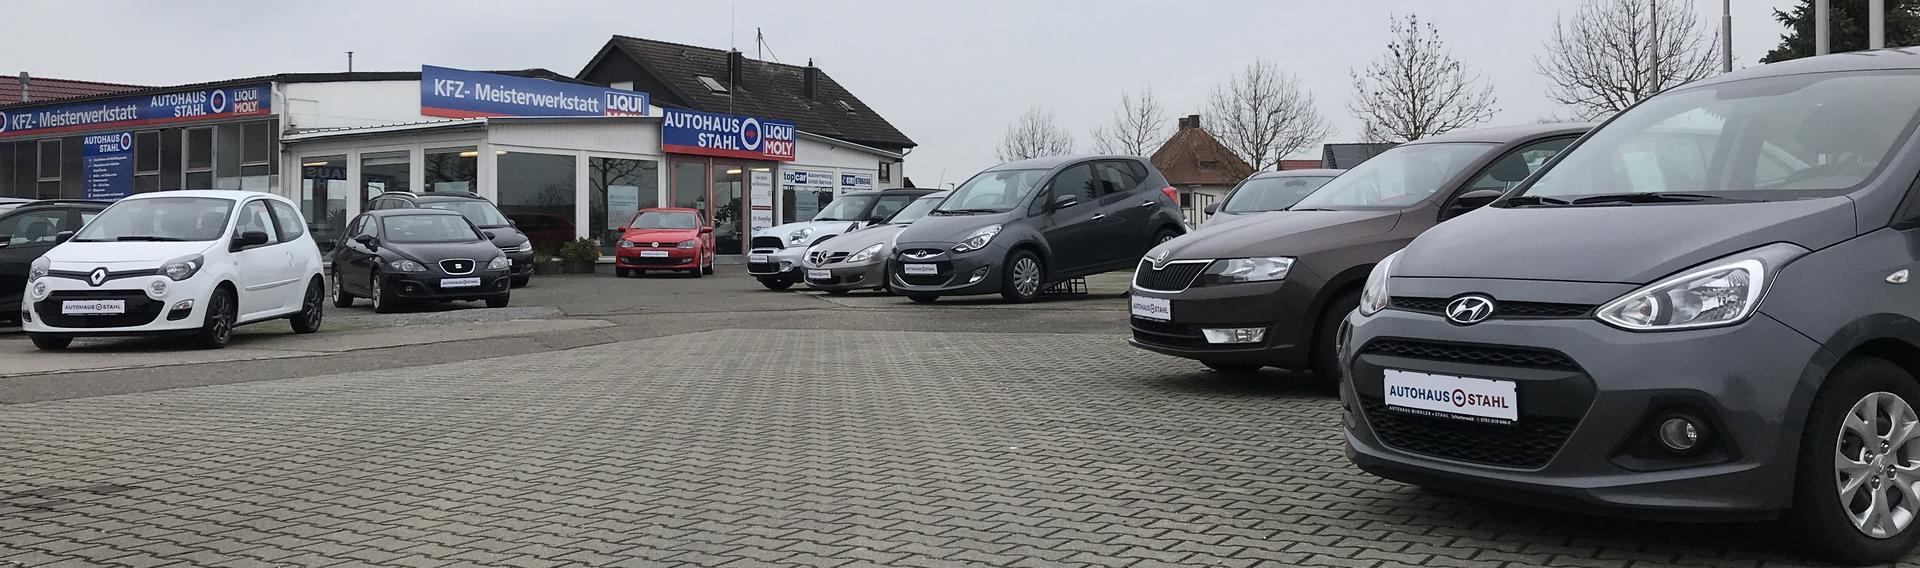 Home - Autohaus Stahl